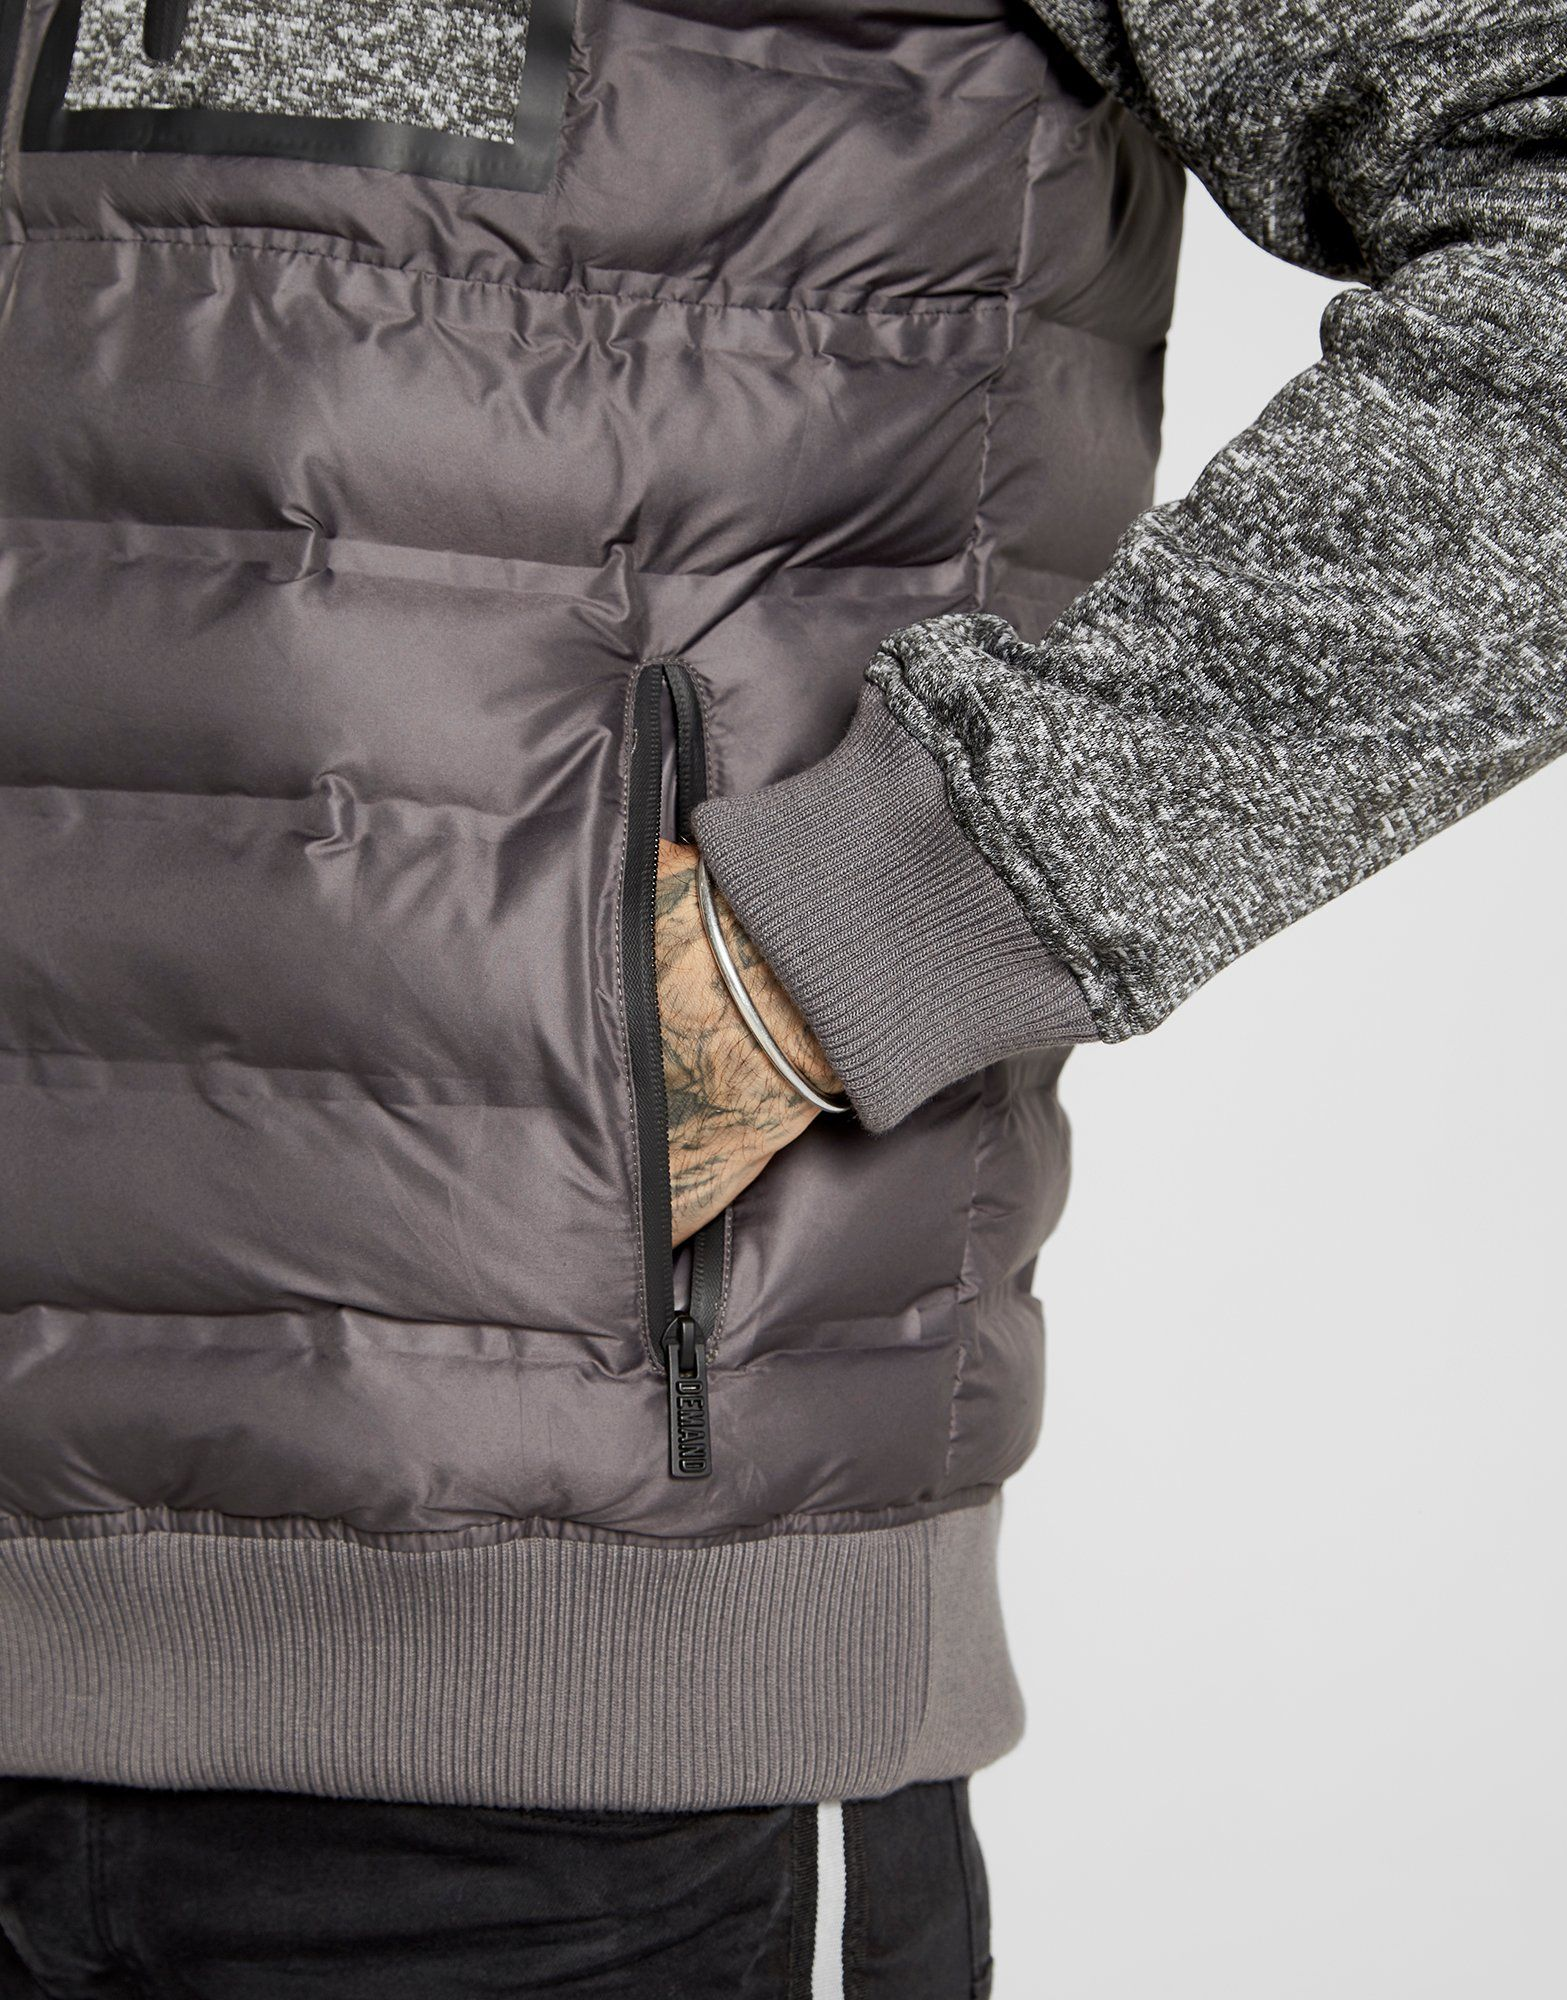 Supply & Demand Dragliner Jacket